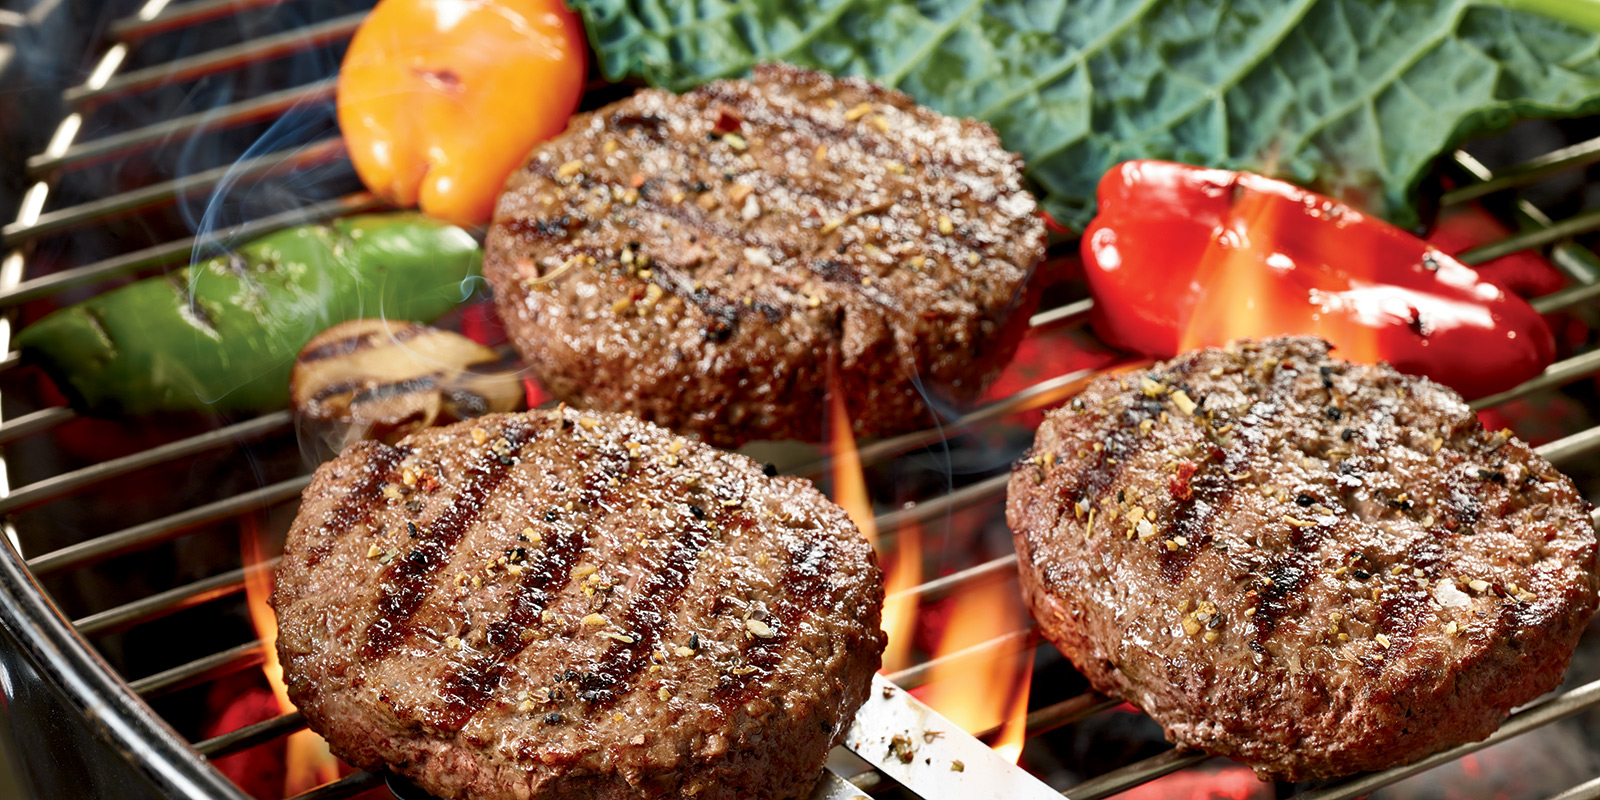 Grass-fed steak burgers from Organic Prairie.